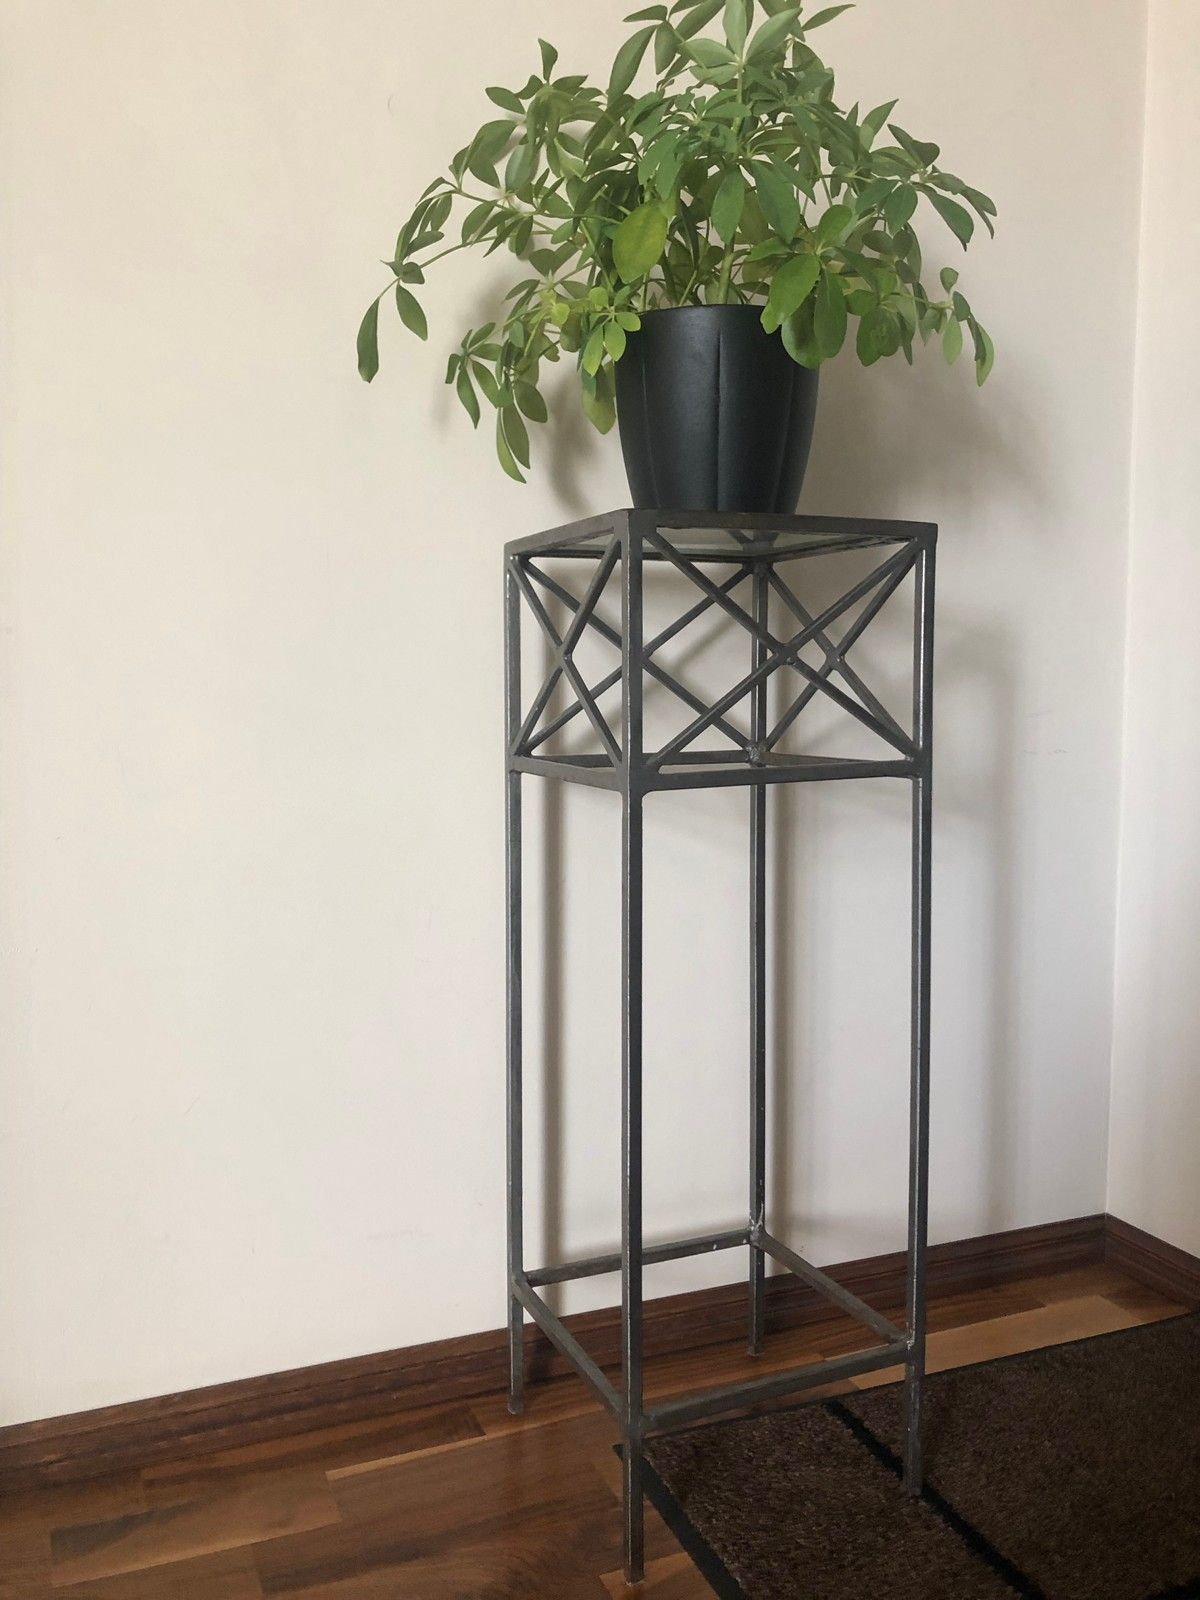 Svært Pidestall i jern | FINN.no DI-47